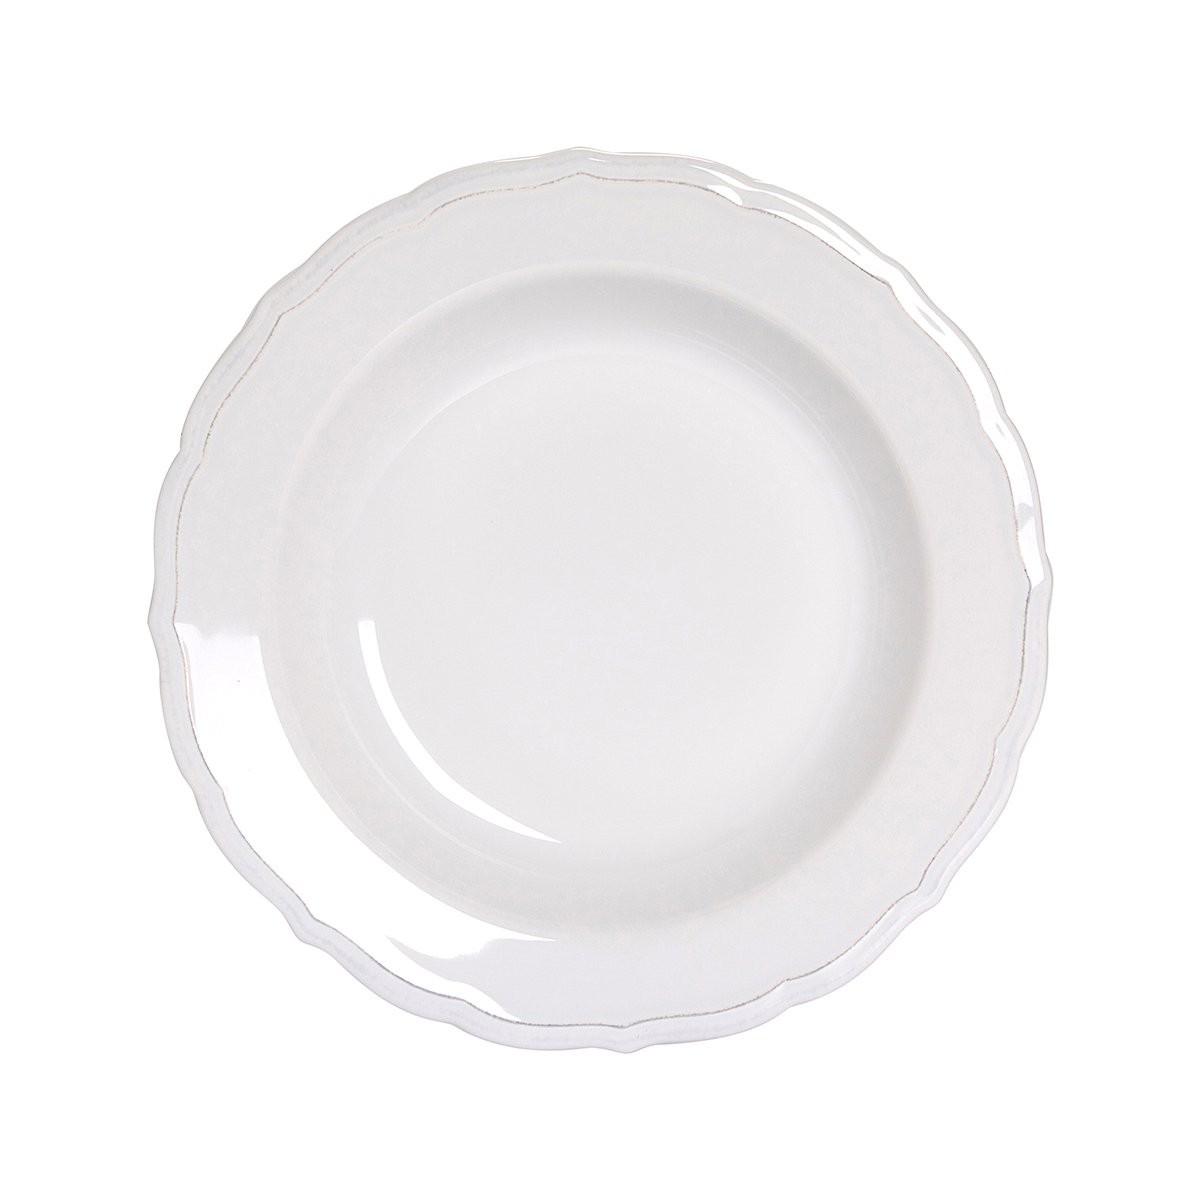 EATON PLACE Hluboký talíř 23,5 cm - bílá